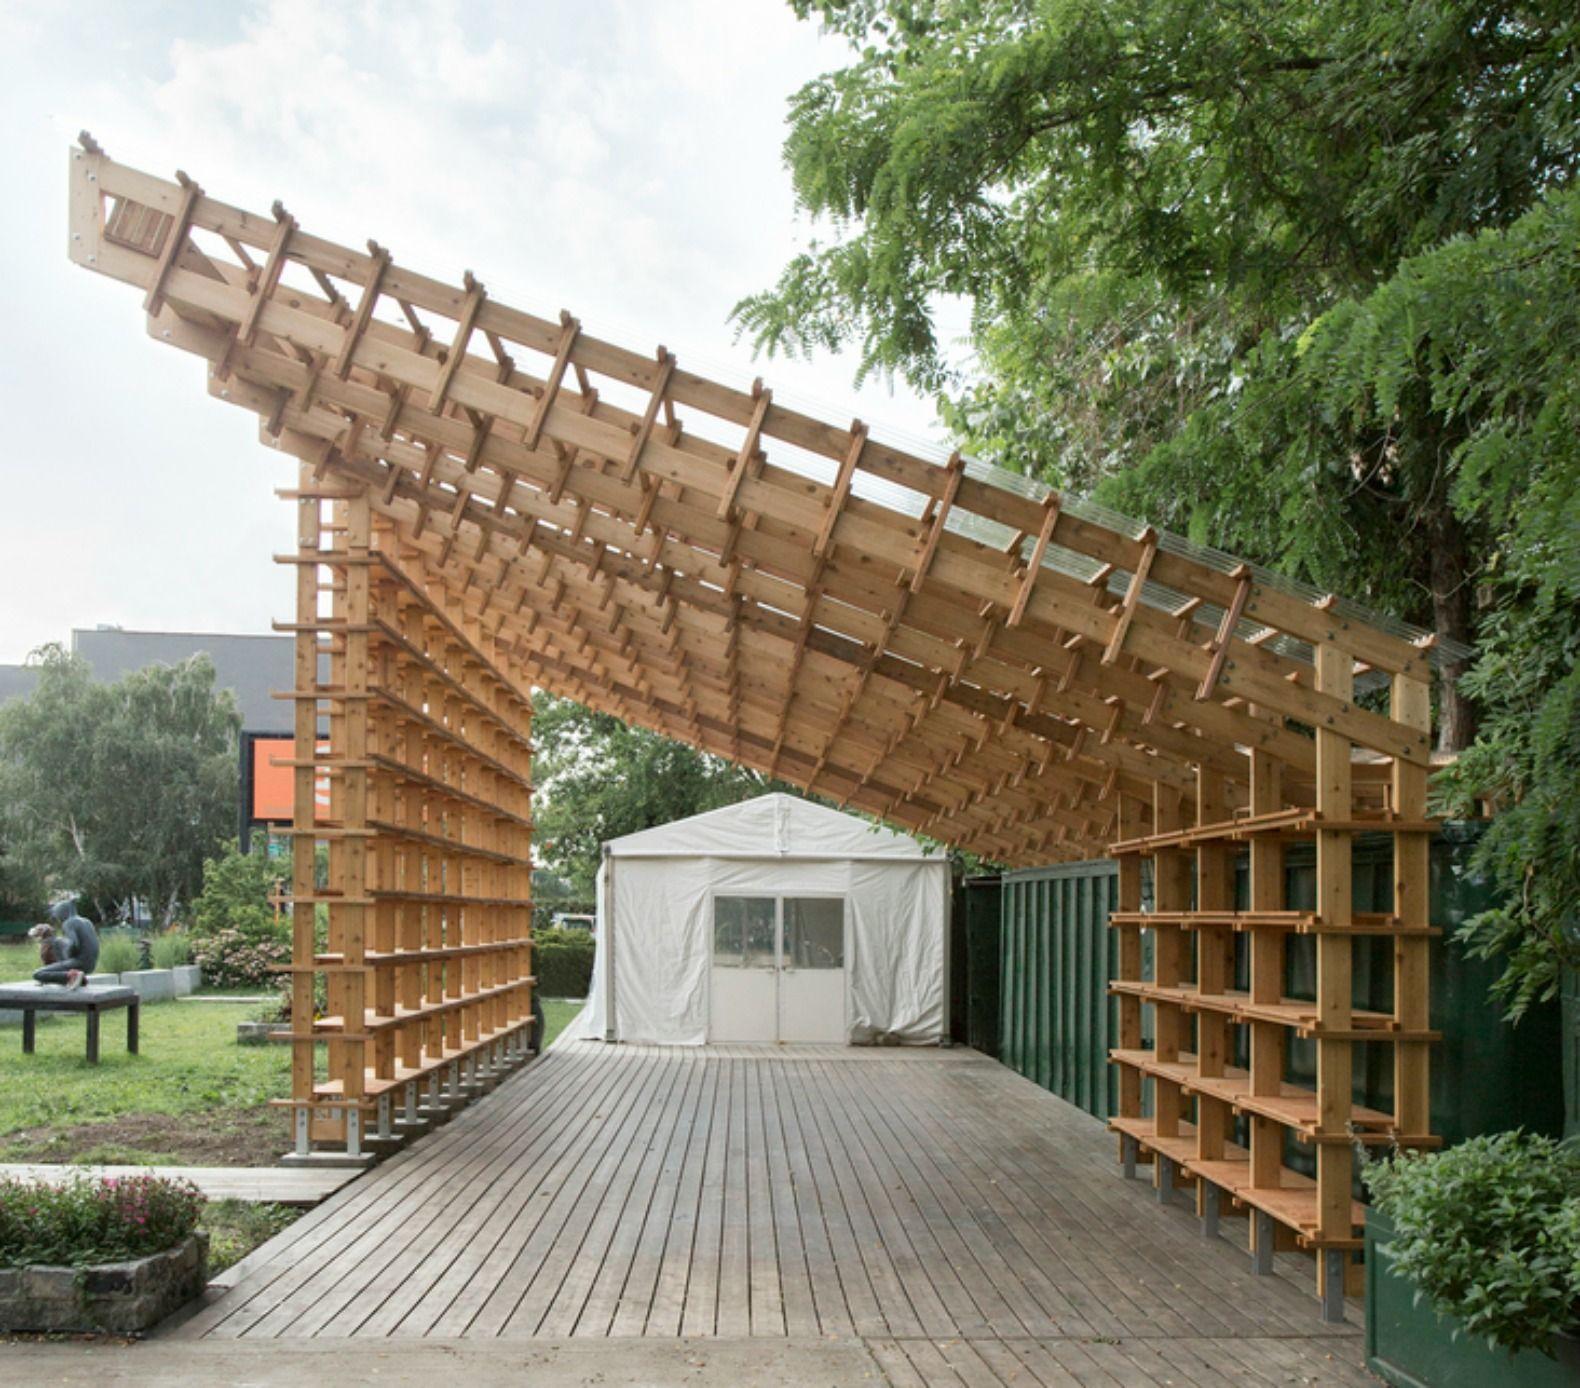 The garden pavilion. We think, believe, build